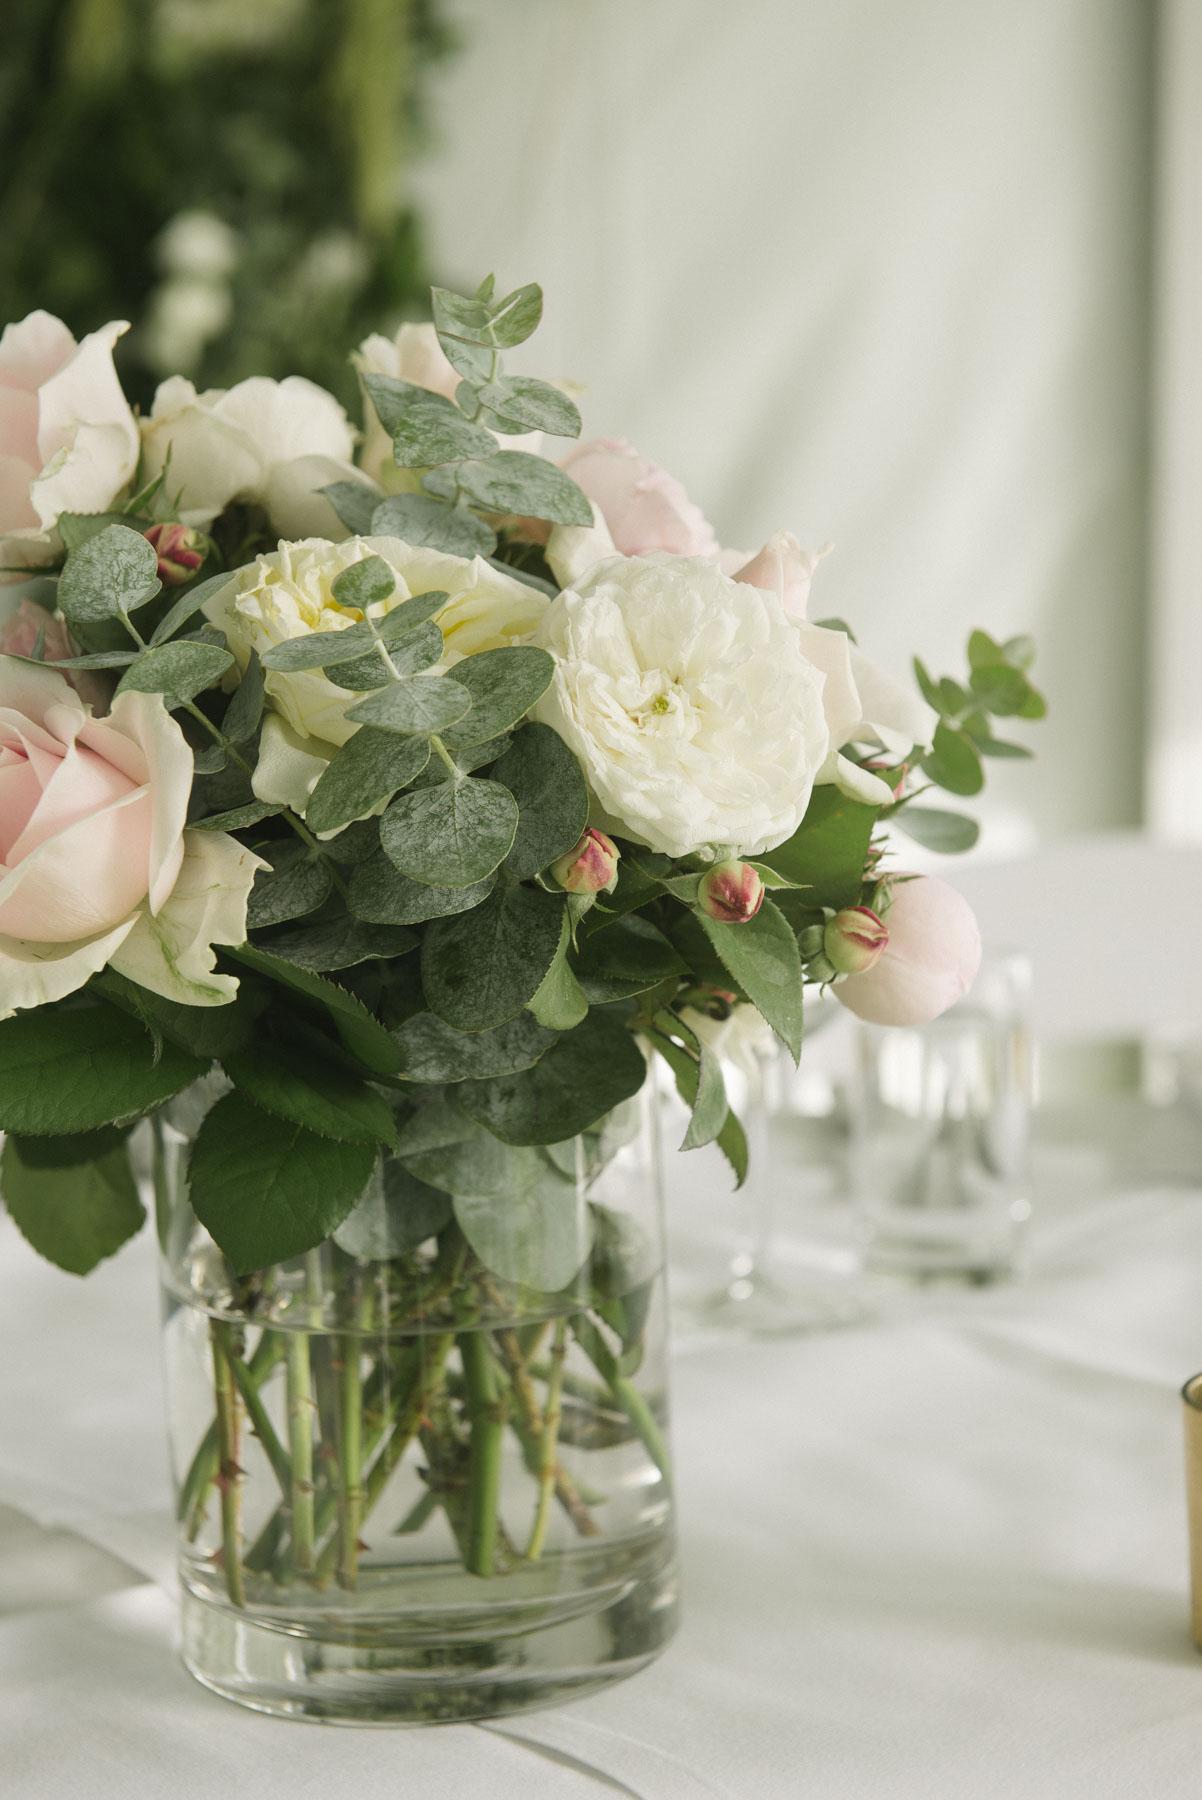 1501vand-281alan_moyle_wedding_portrait_brighton_bayside_werribee_estate_mansion_zoo_rustic_styled_garden_mansion_candid_documentry_victoria_whitelaw.jpg